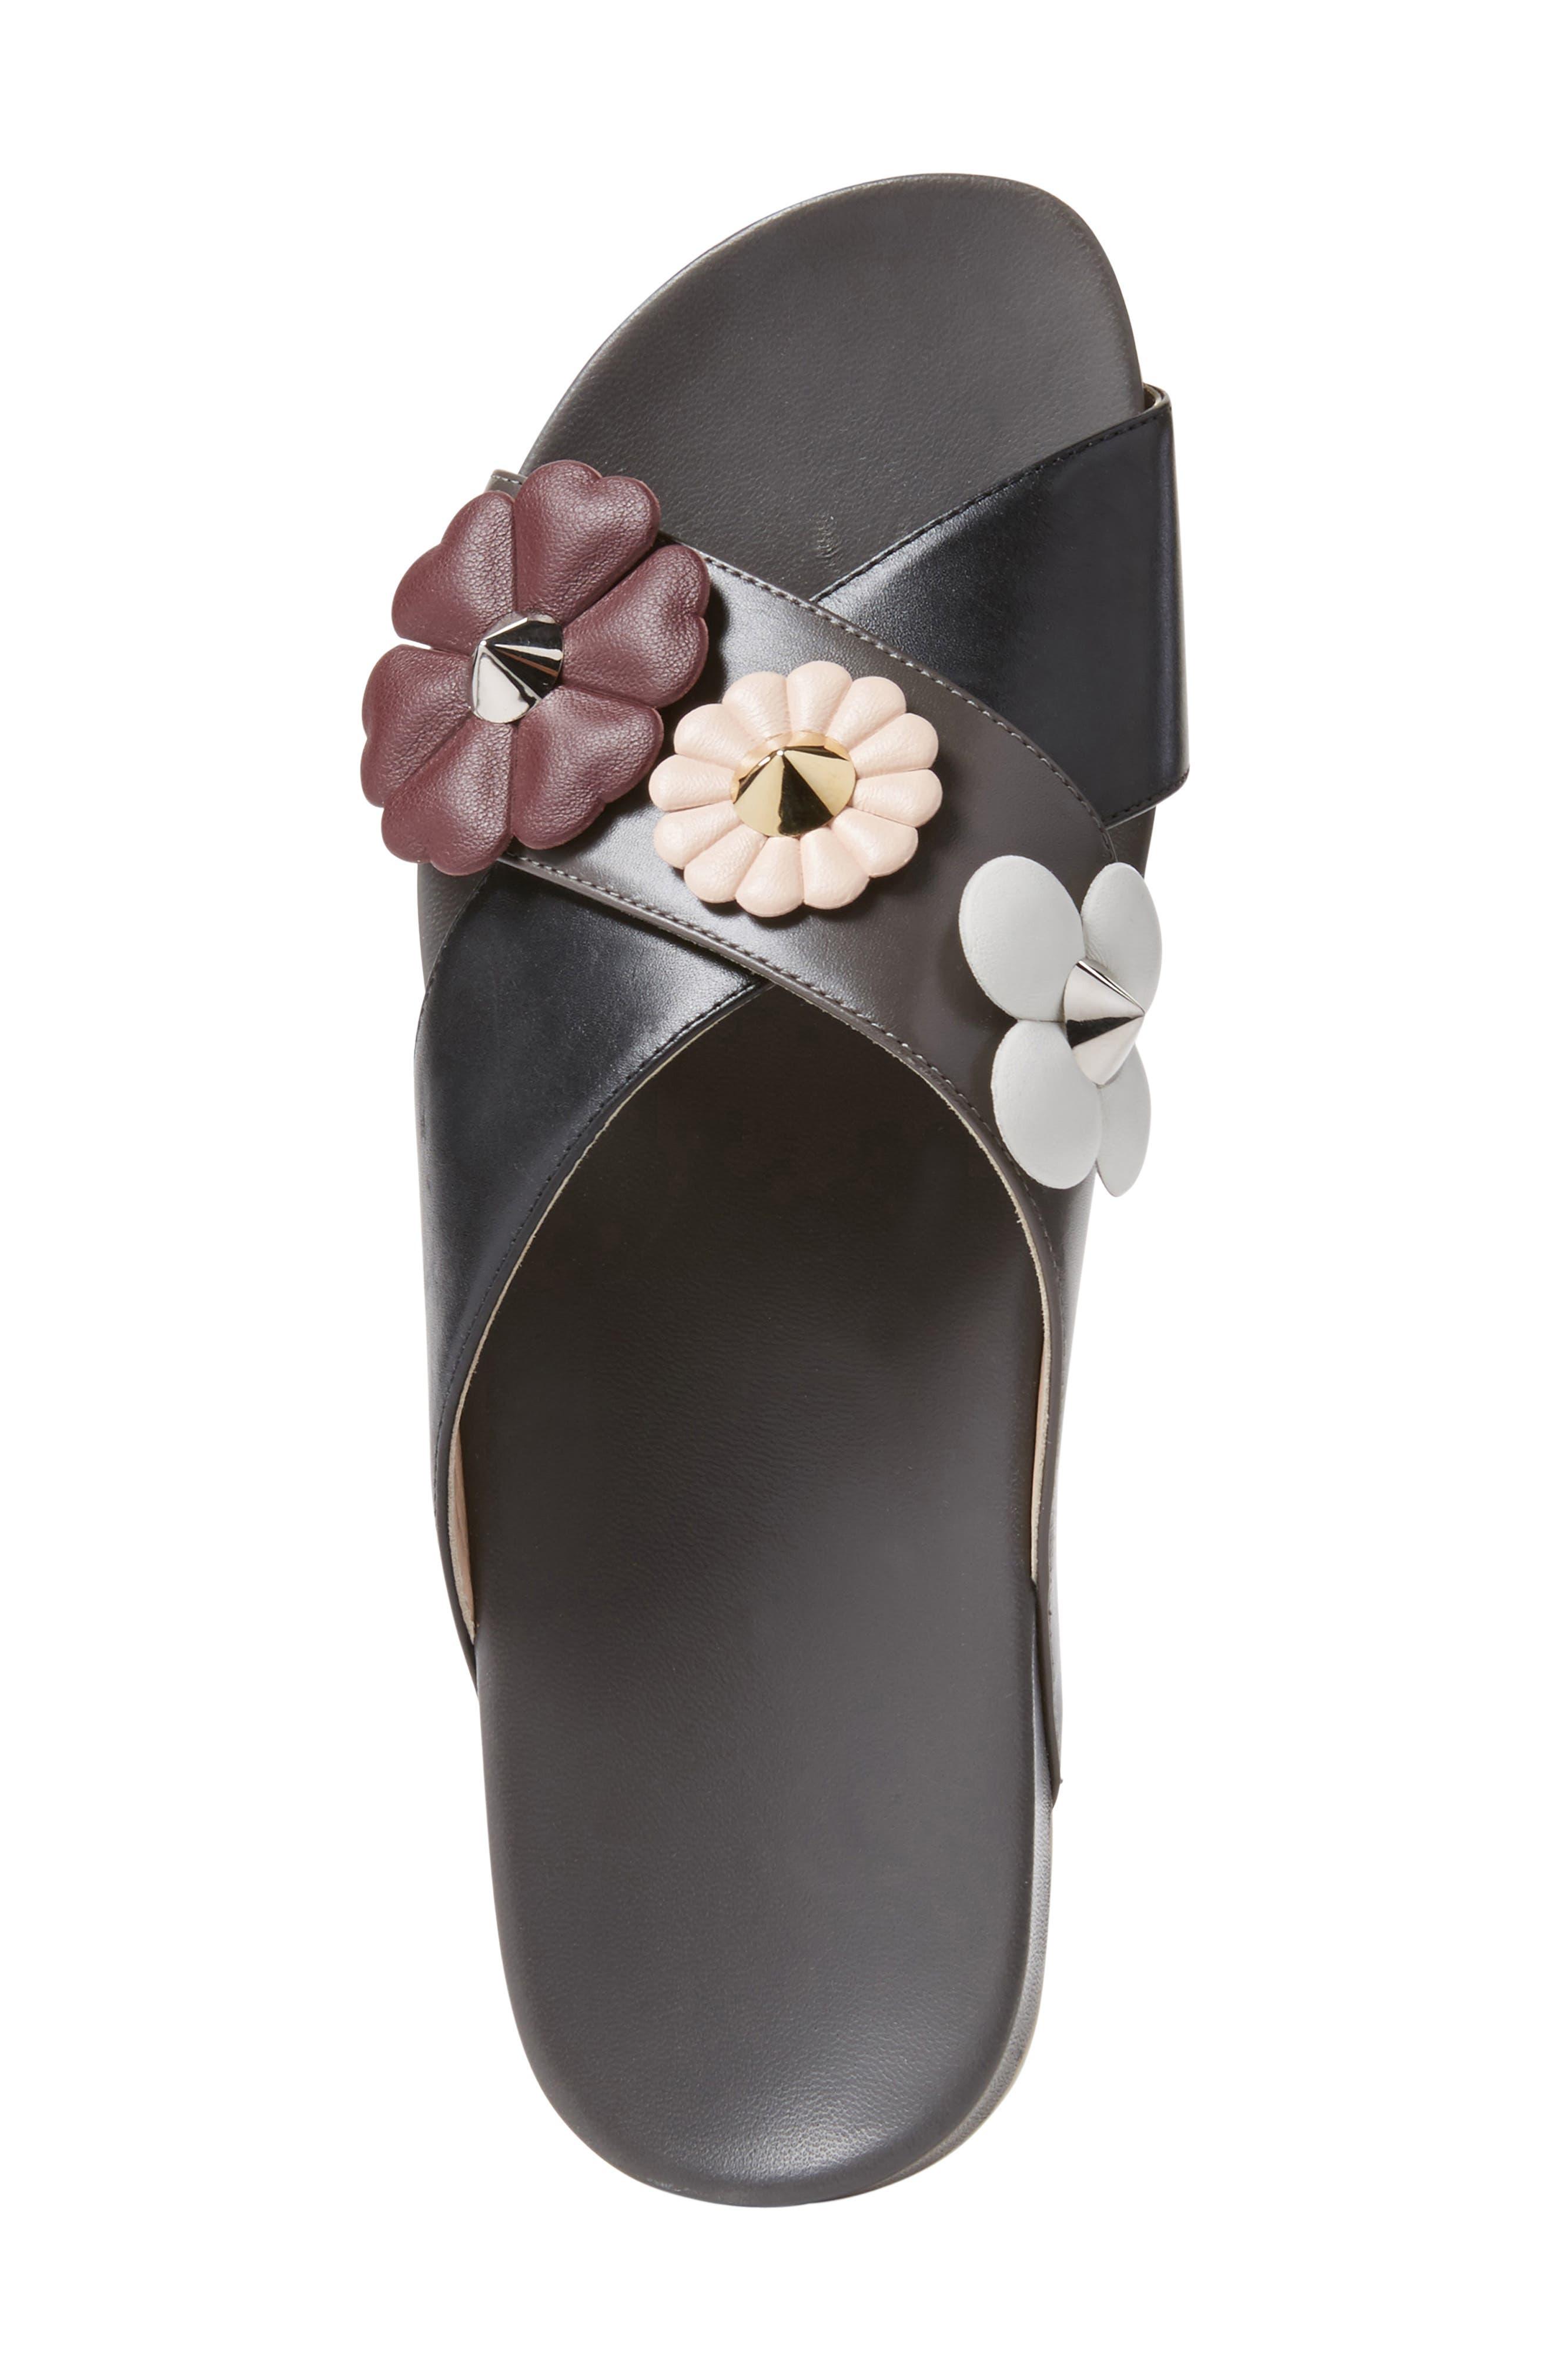 Flowerland Slide Sandal,                             Alternate thumbnail 4, color,                             Black/ Purple